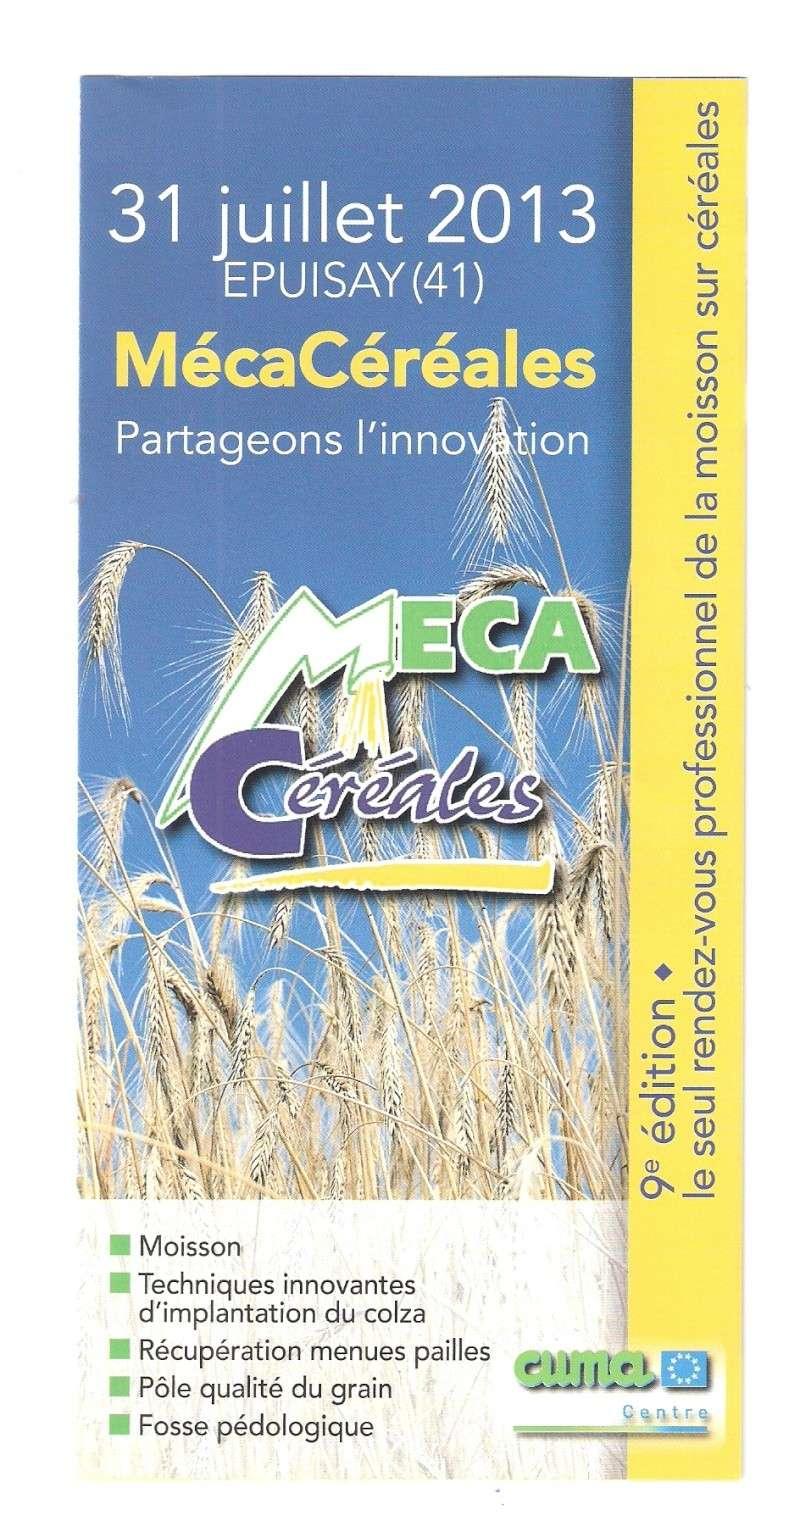 meca cereales Meca10